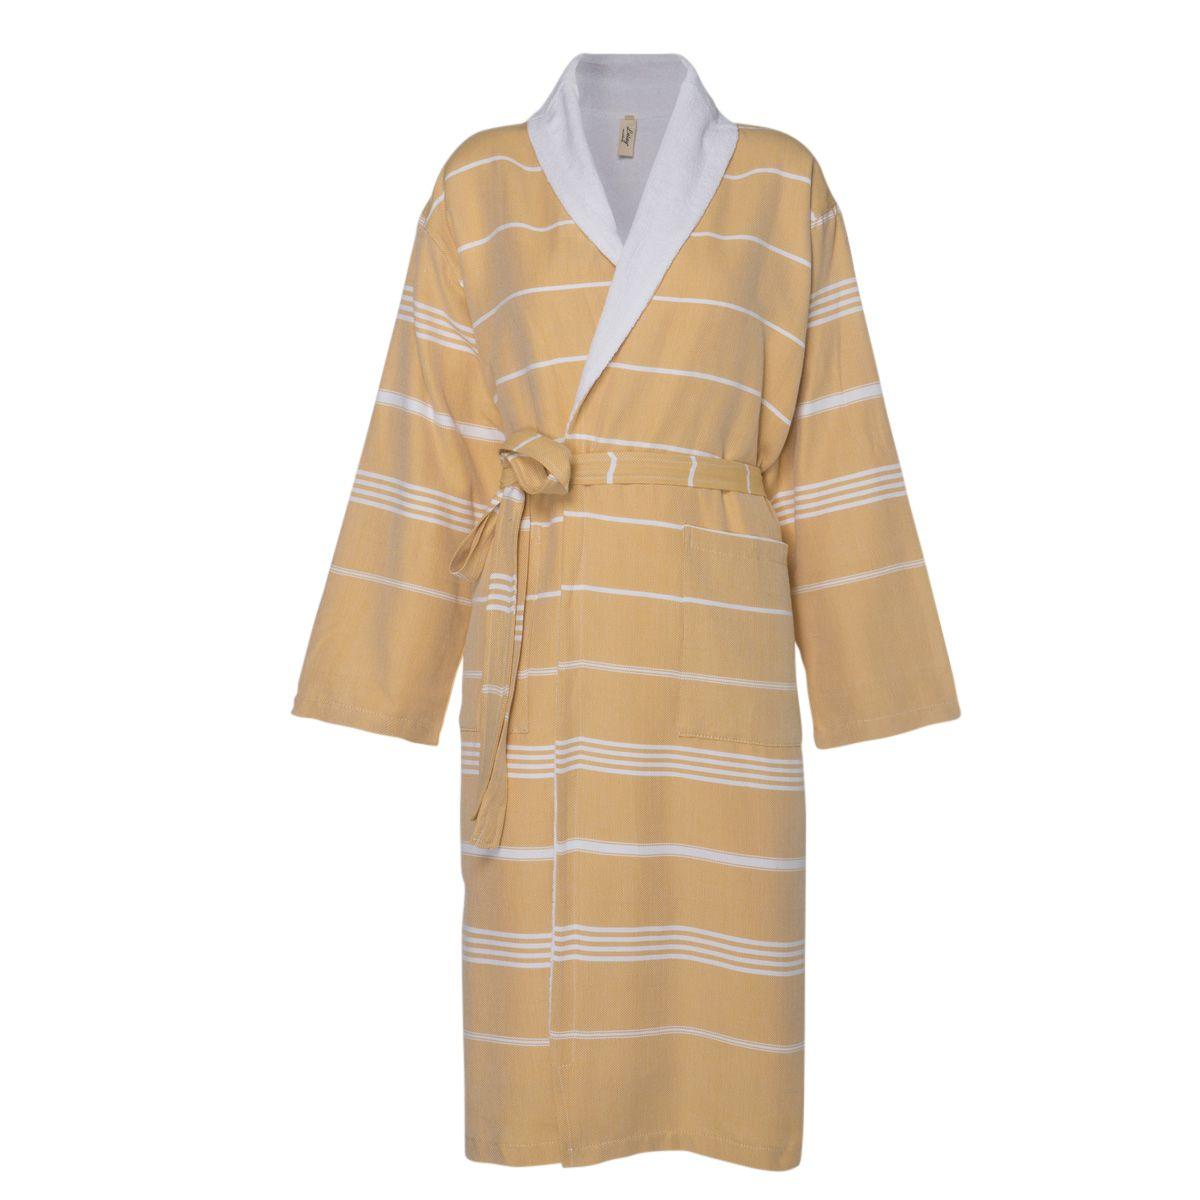 Bathrobe Leyla / With Towel Lining - Yellow